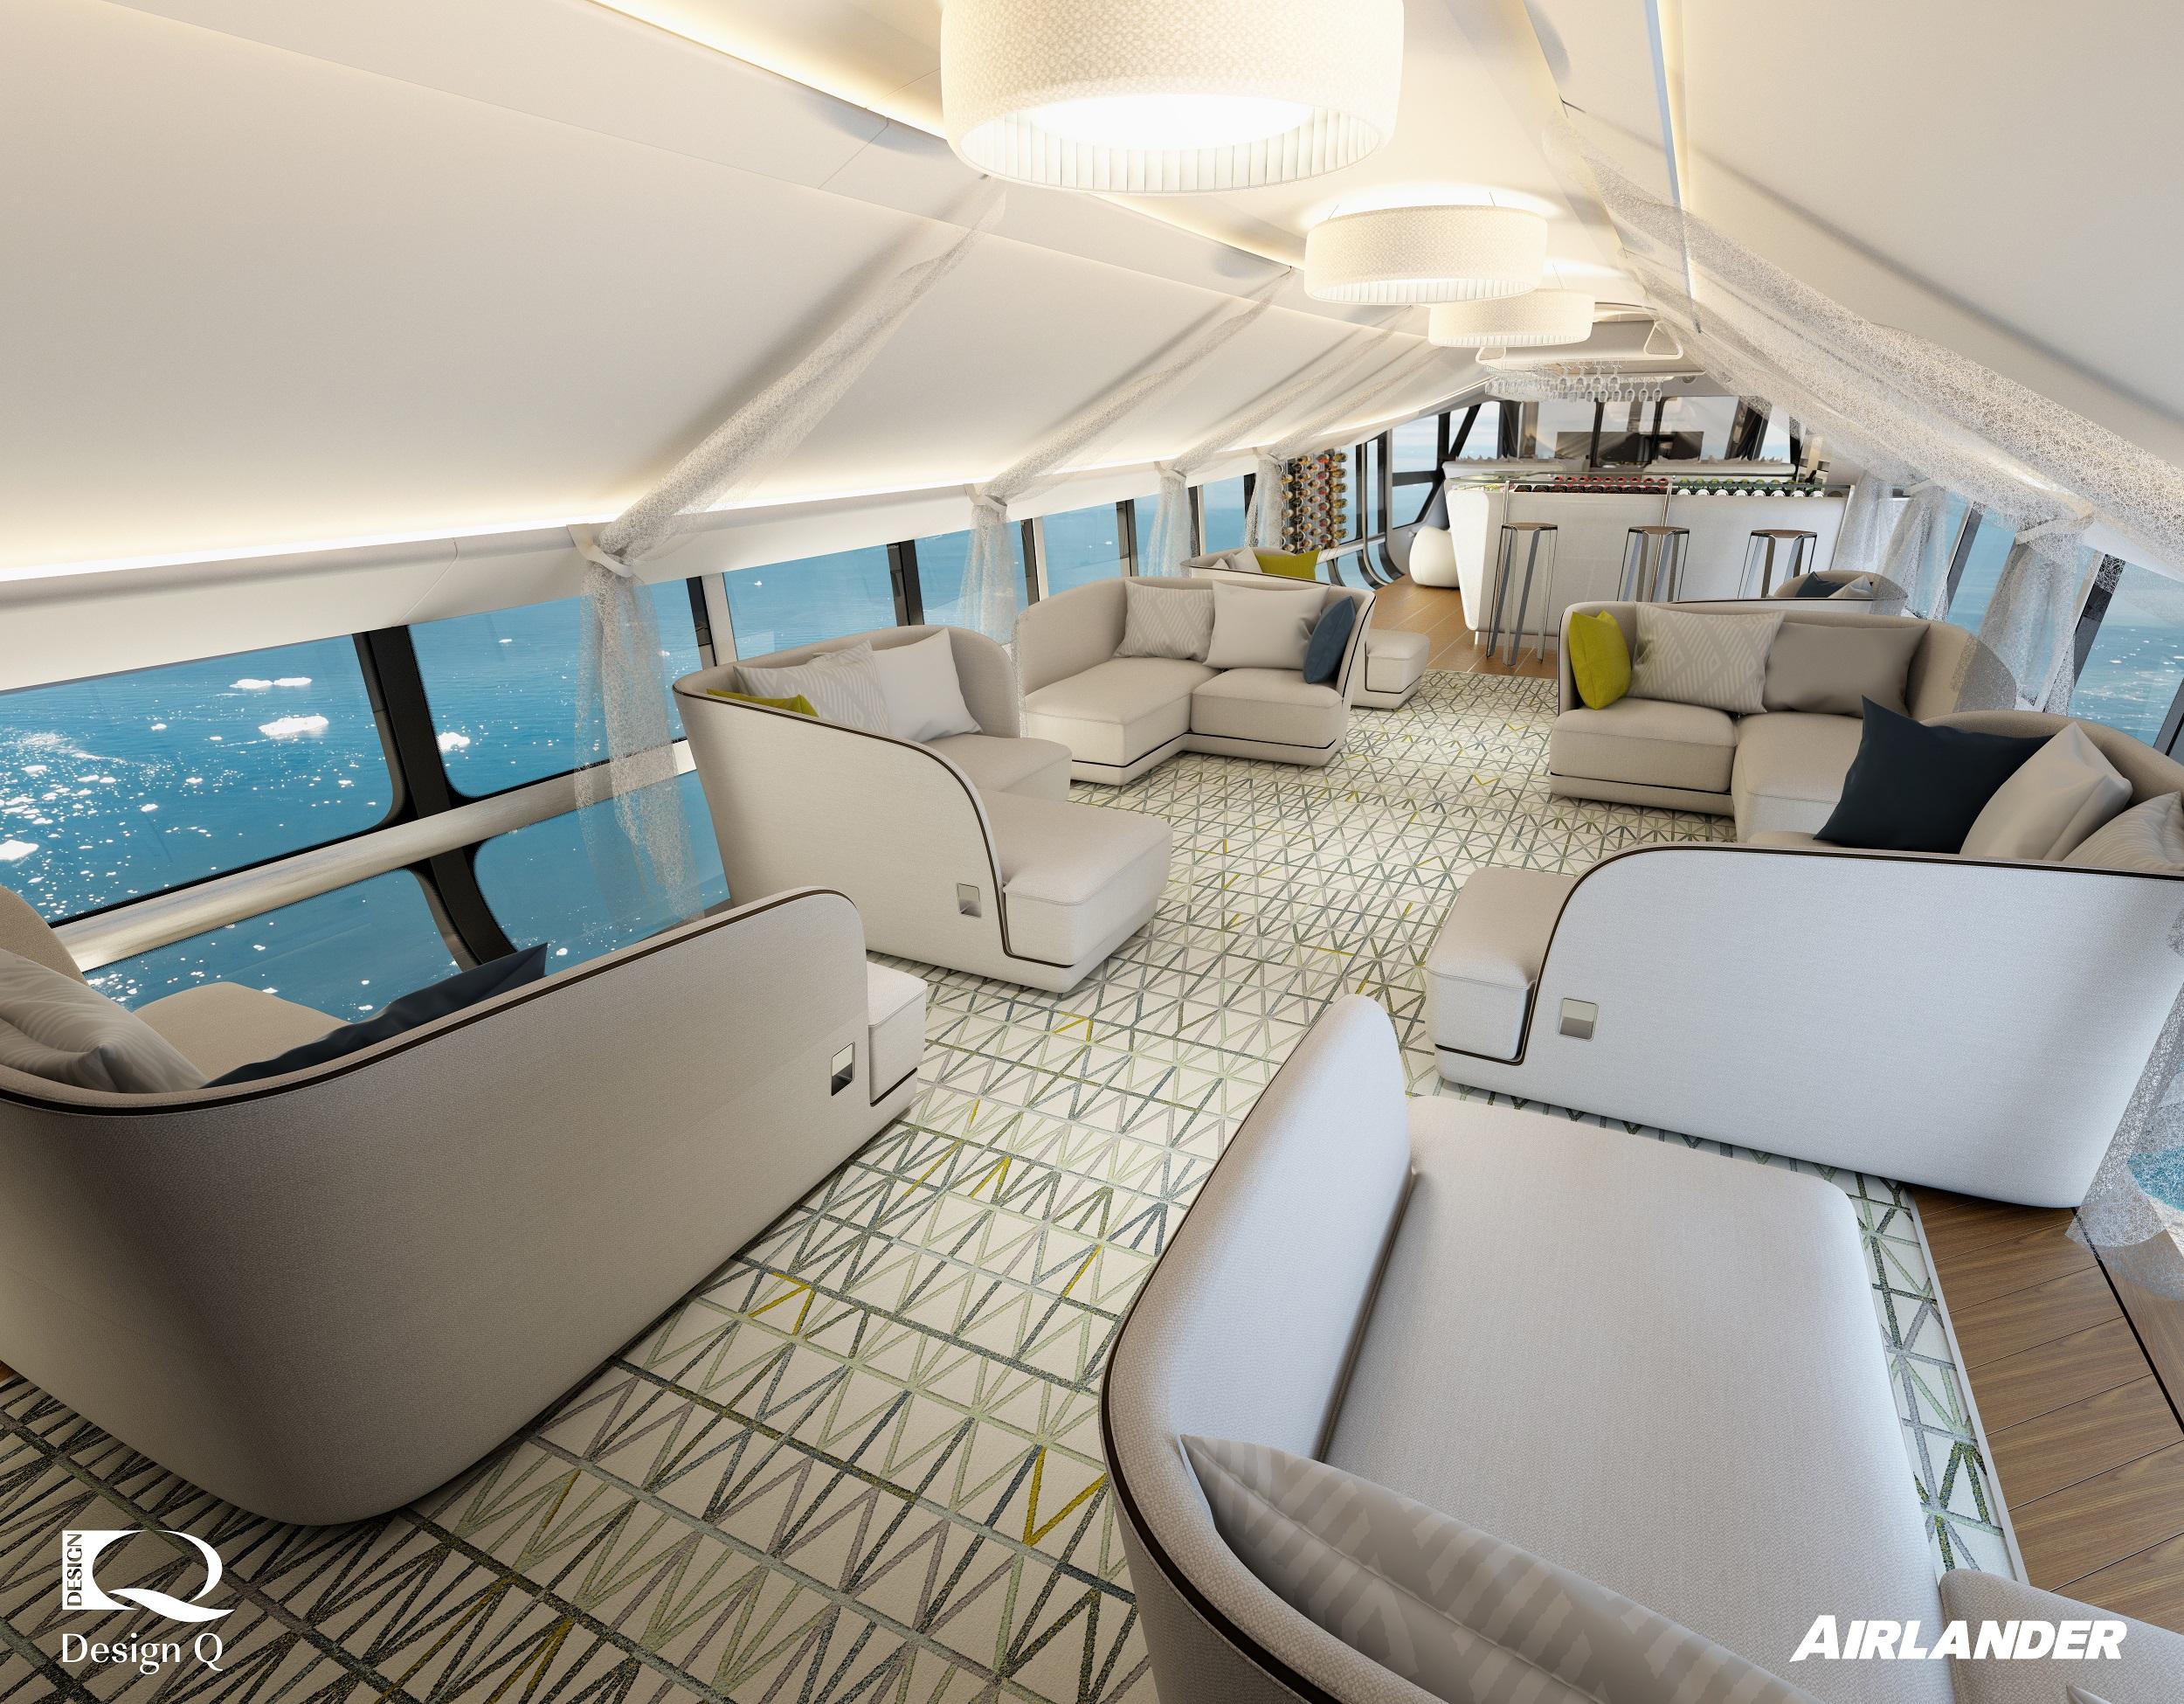 Airlander Interior 3